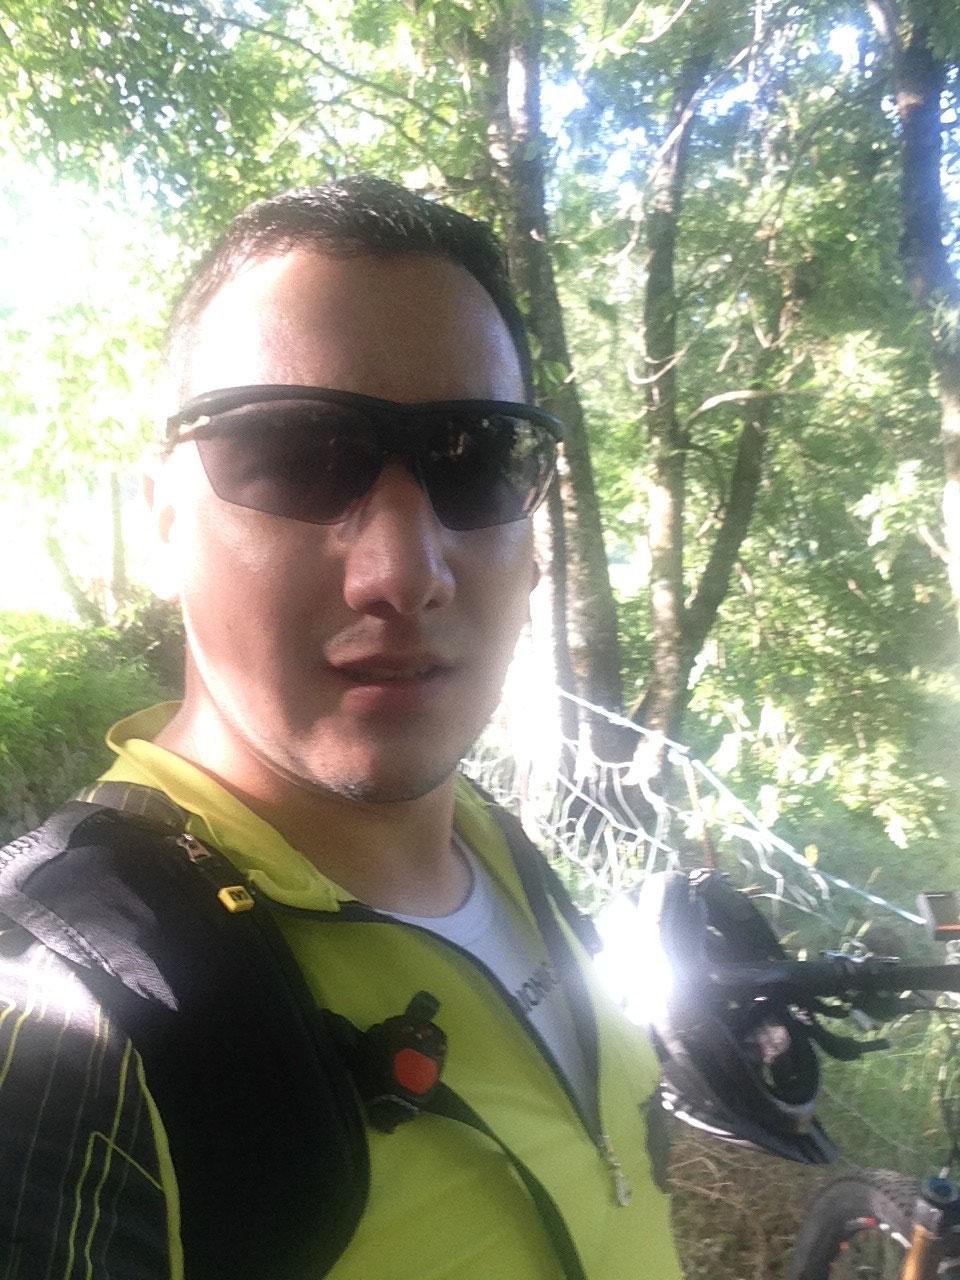 Biketour Breithorn VS 2559m ü. M. (26. Juli 2015)